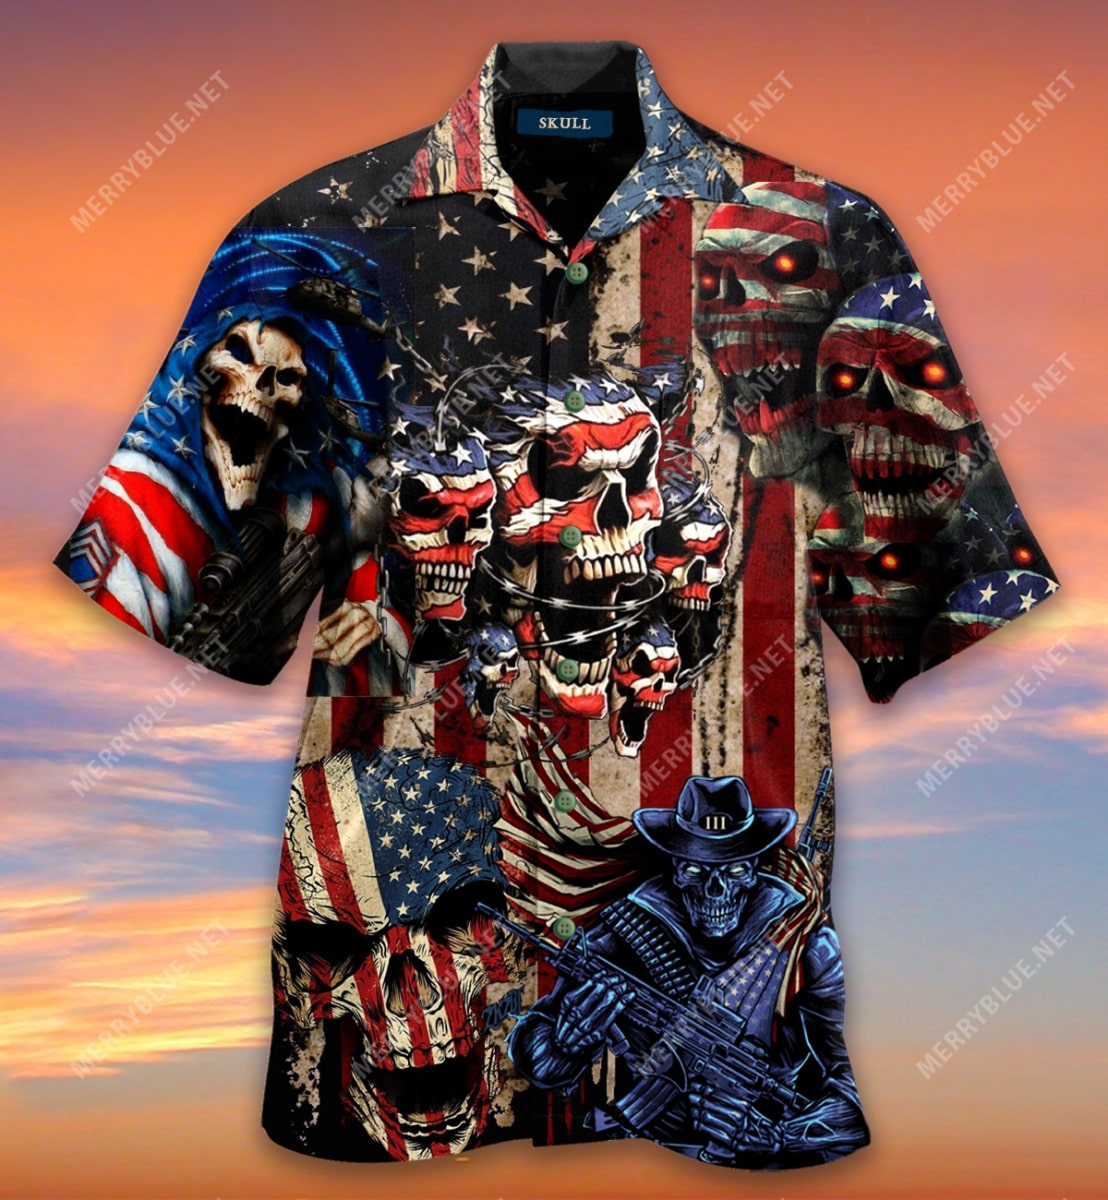 american flag skull all over printed hawaiian shirt 5